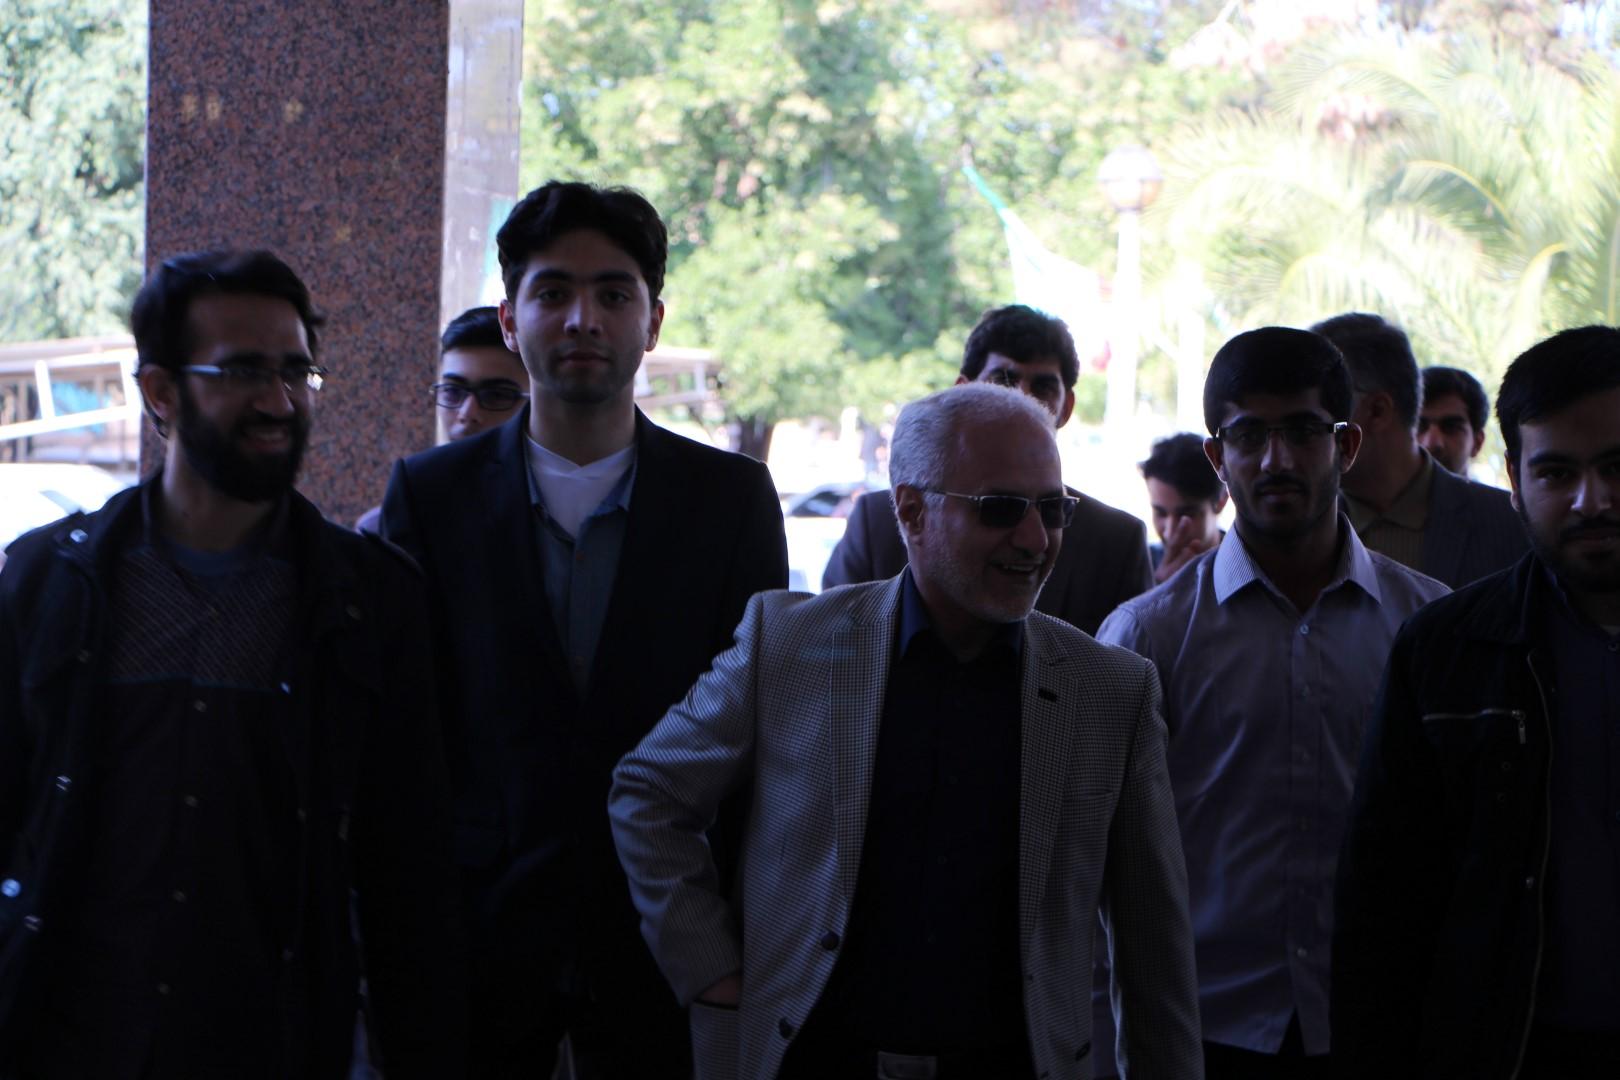 IMG 5114 گزارش تصویری؛ سخنرانی استاد حسن عباسی با موضوع از چوئن لای تا سیاست درهای باز